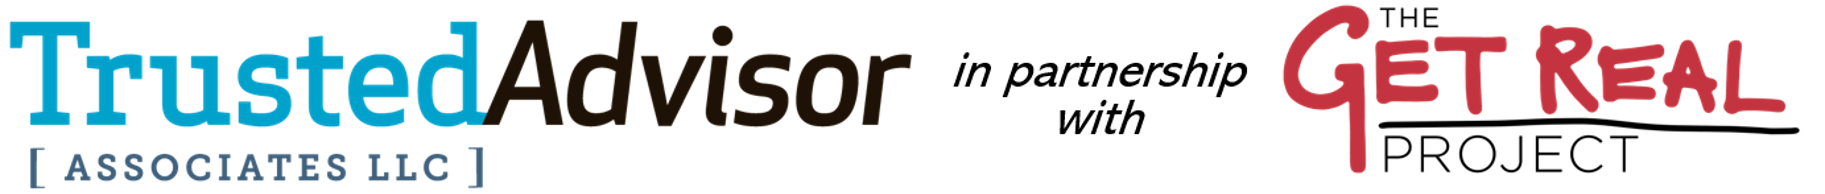 Trusted Advisor Associates logo